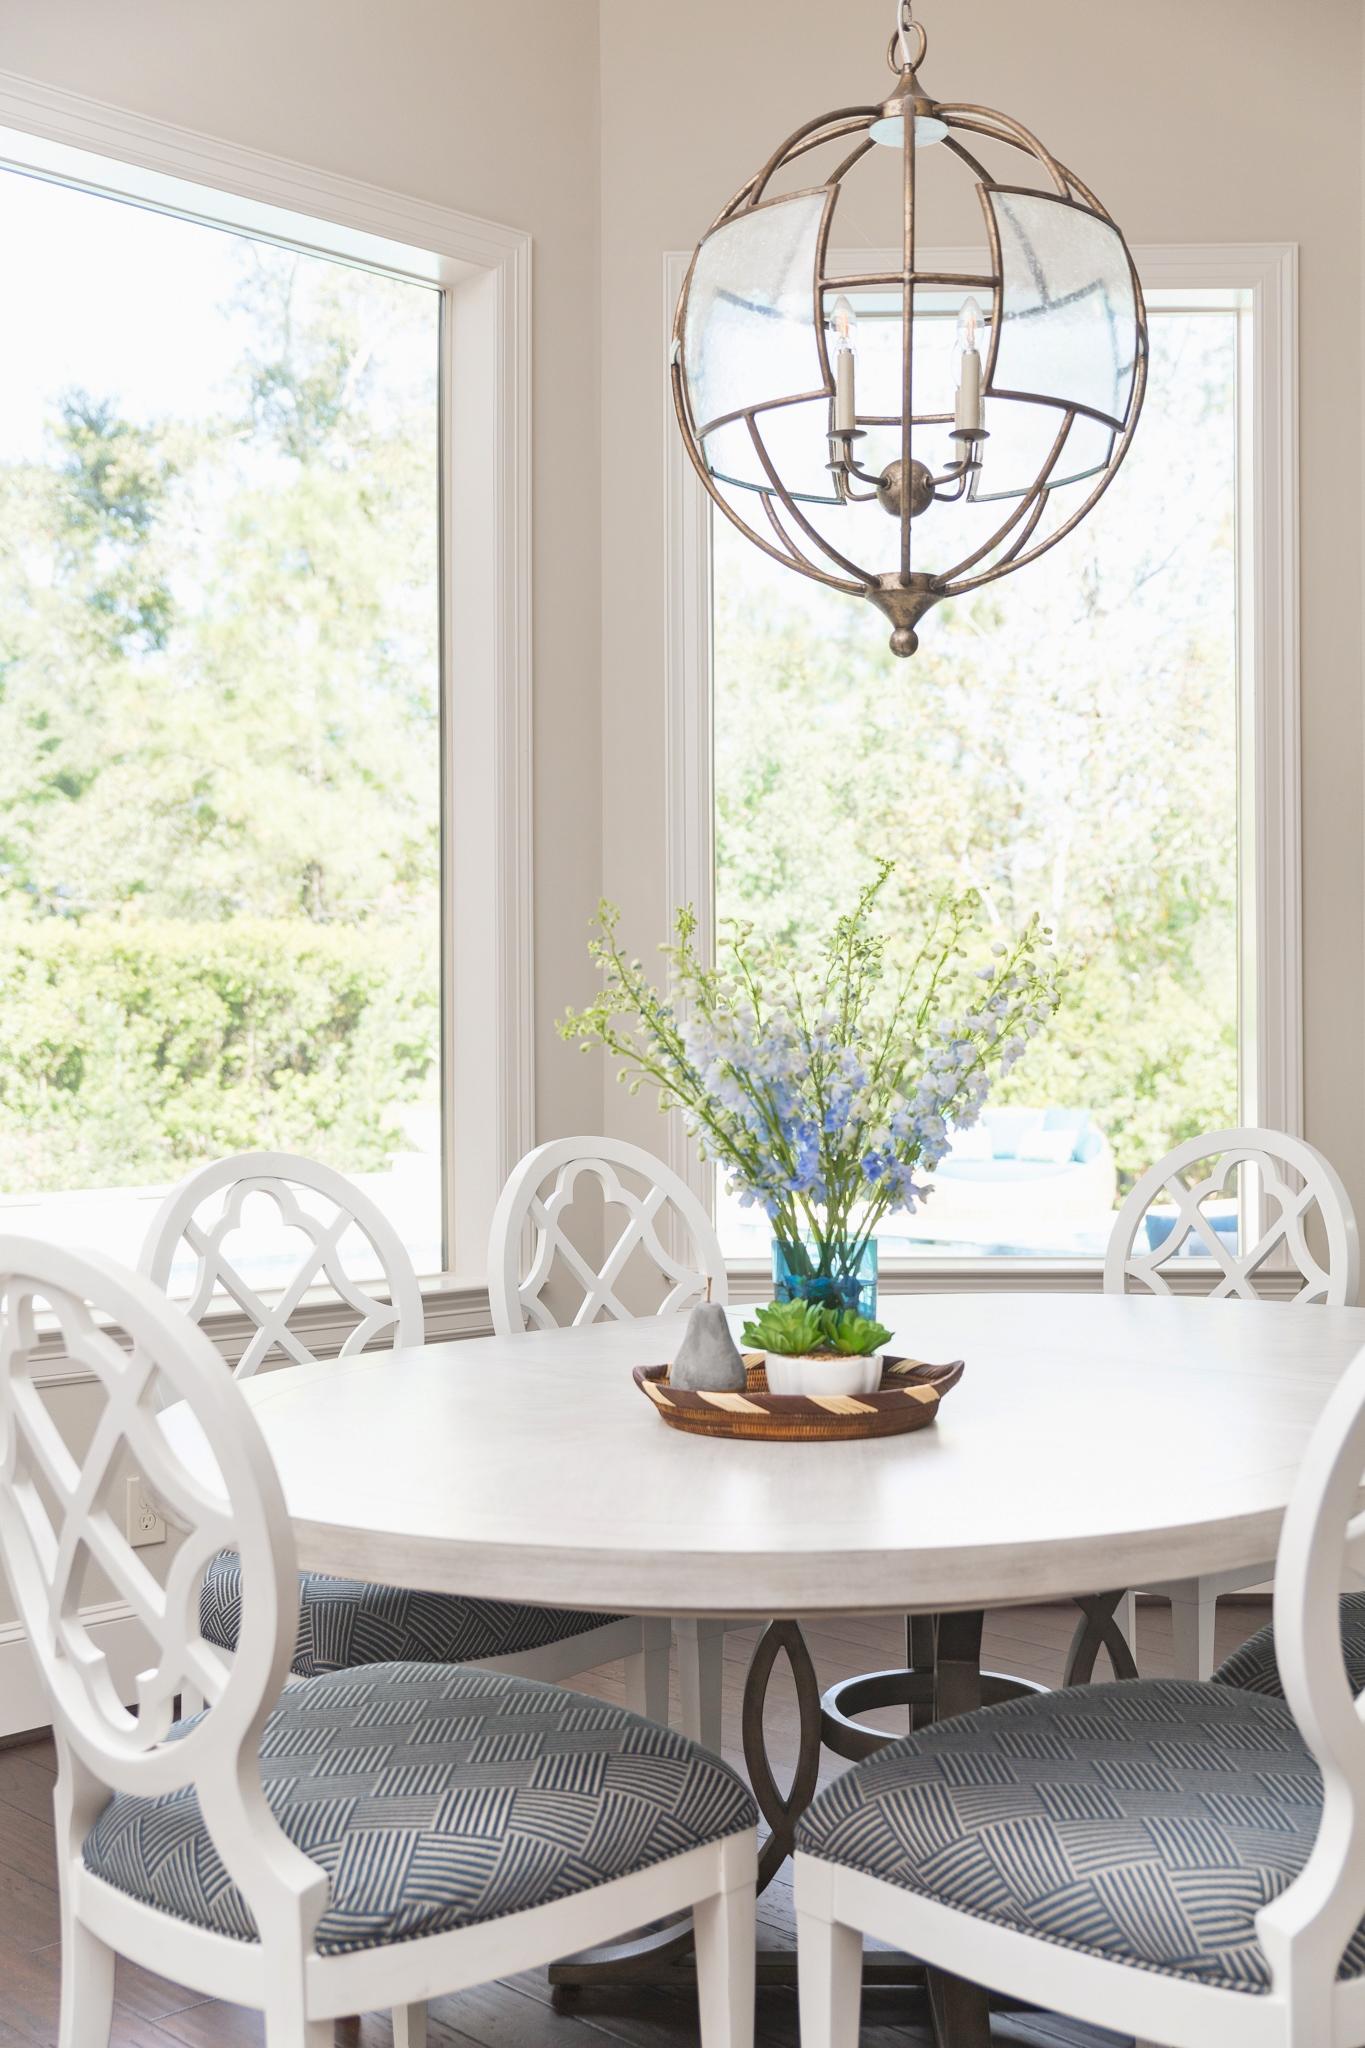 Project Reveal - Family room, backyard oasis, breakfast room | Carla Aston, Designer | Colleen Scott, Photographer | #breakfastroom #breakfastroomideas #diningtable